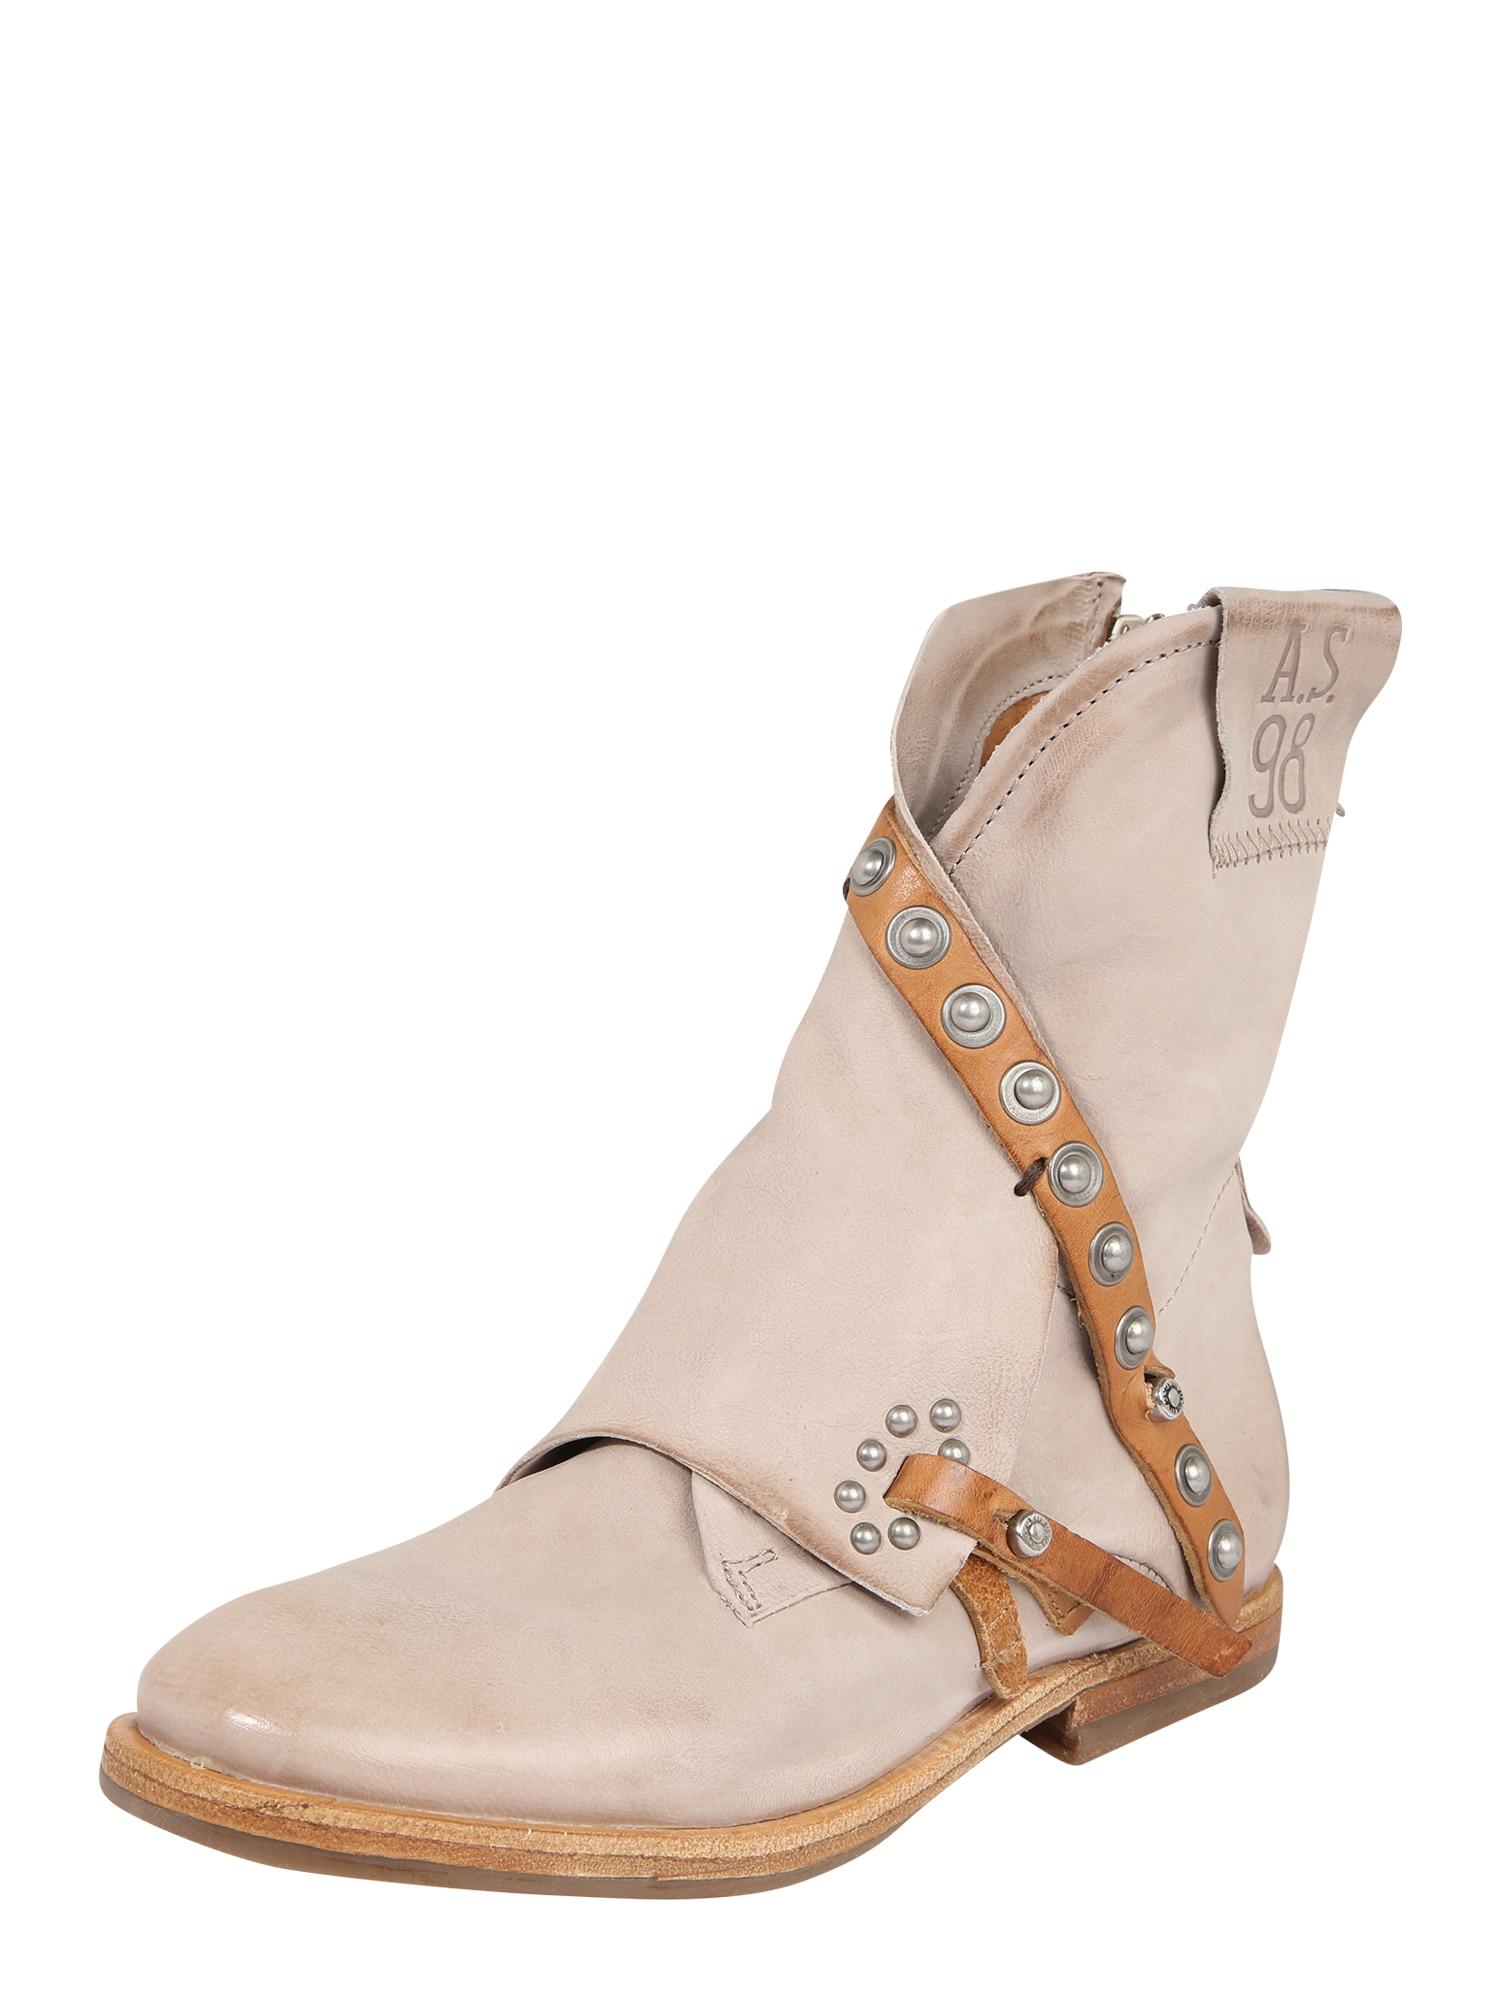 A.S.98 Auliniai batai ruda / gelsvai pilka spalva